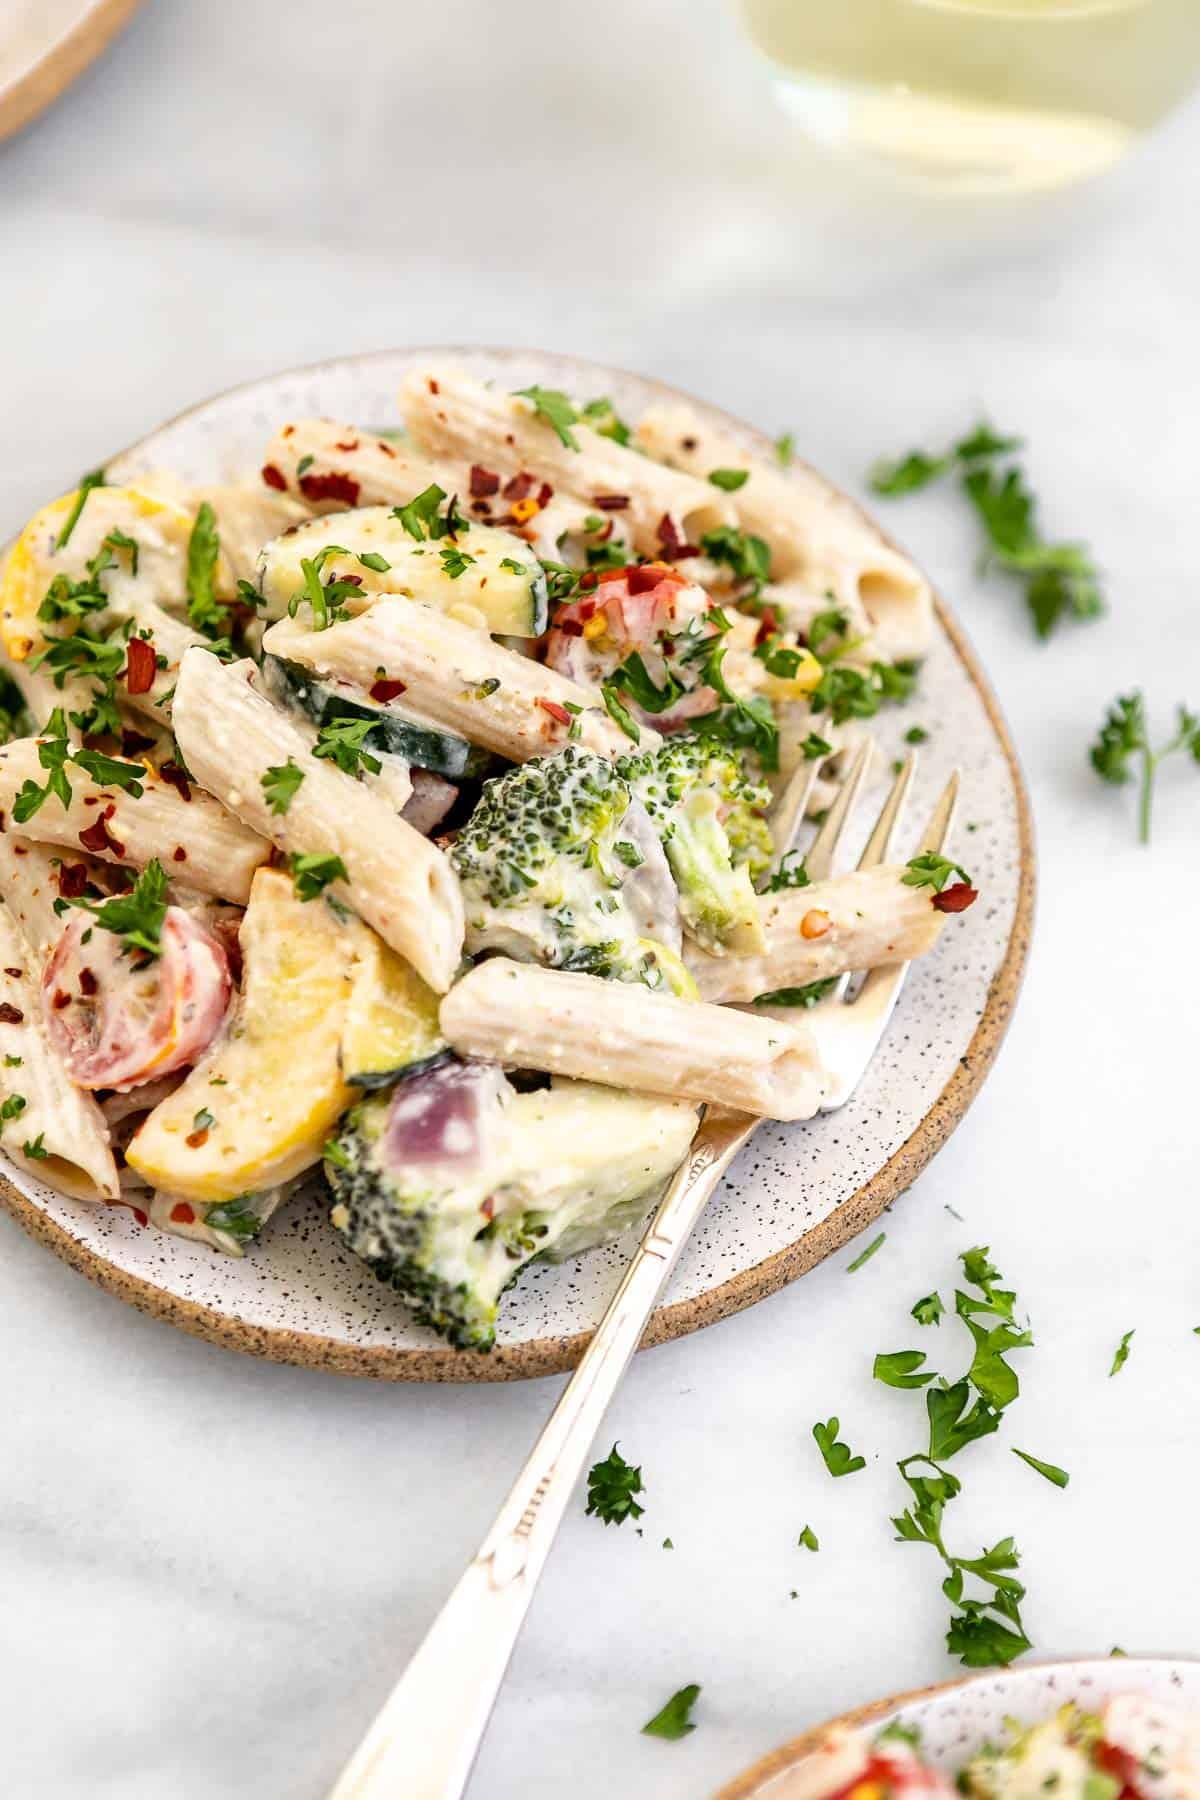 vegan pasta primavera on a plate with parsley